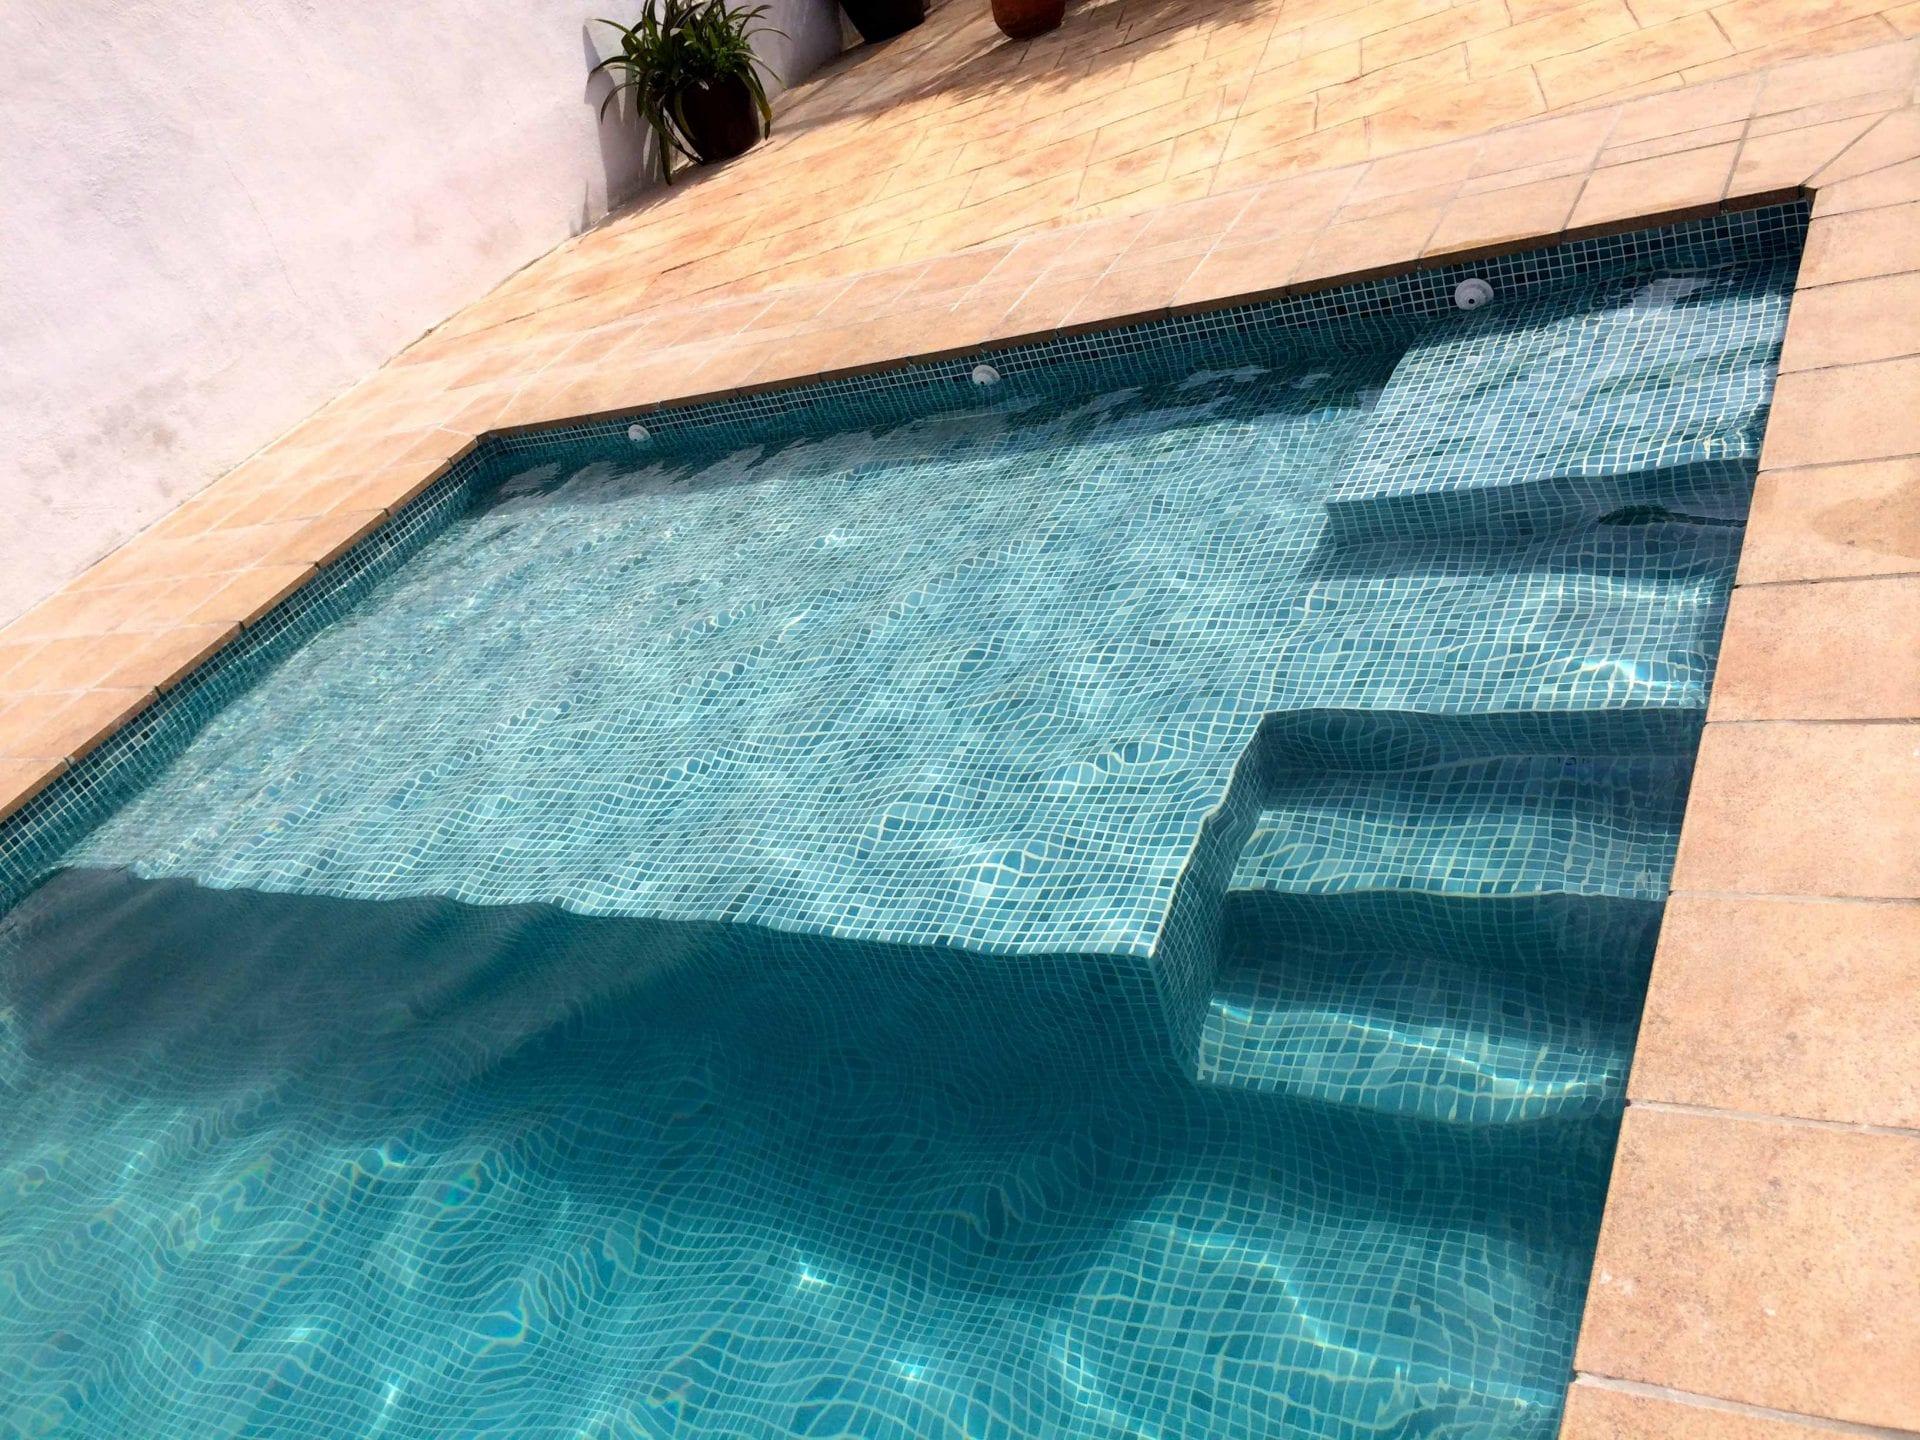 Gresite verde aguamarina antideslizante malla - Gresite piscinas precio ...